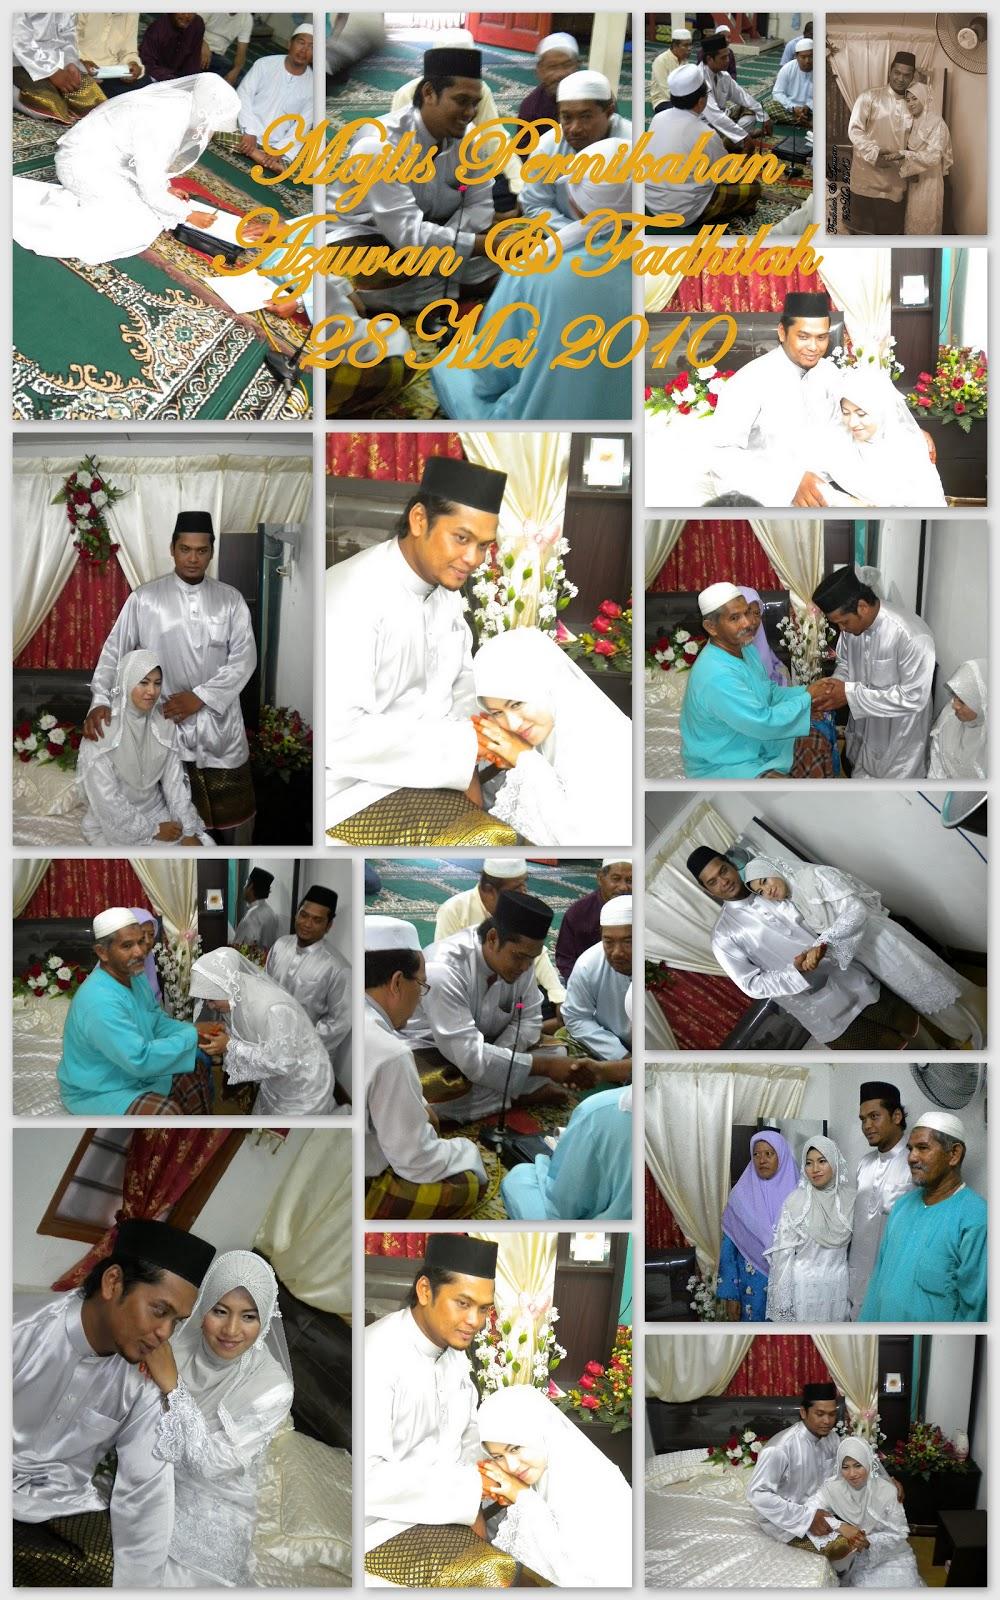 Download image Ucapan Ulang Tahun Perkahwinan Ajilbab Com Portal PC ...